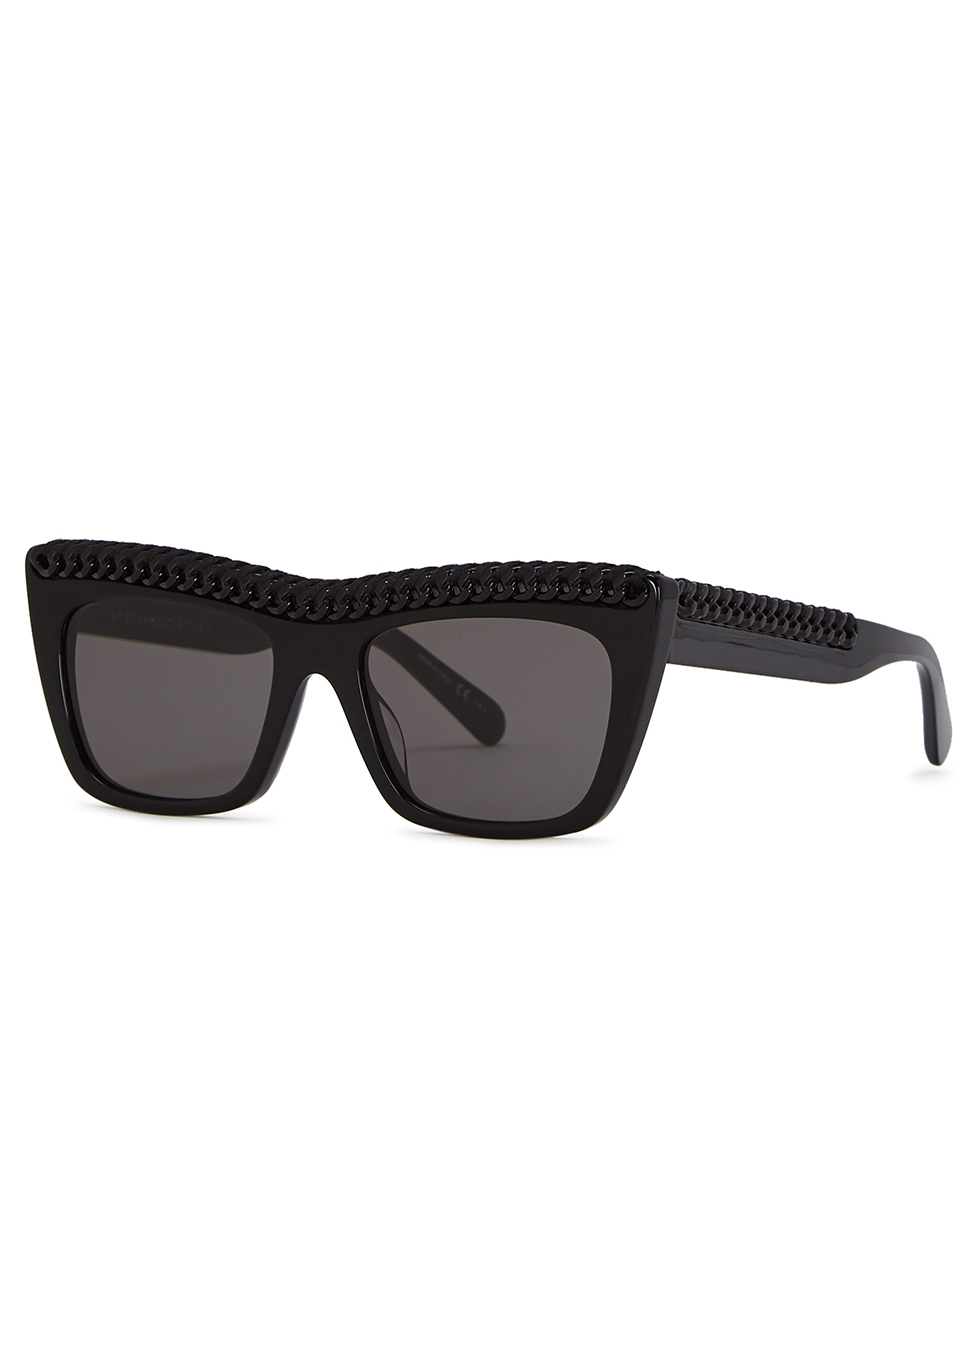 39433847b08bc Women s Designer Sunglasses and Eyewear - Harvey Nichols